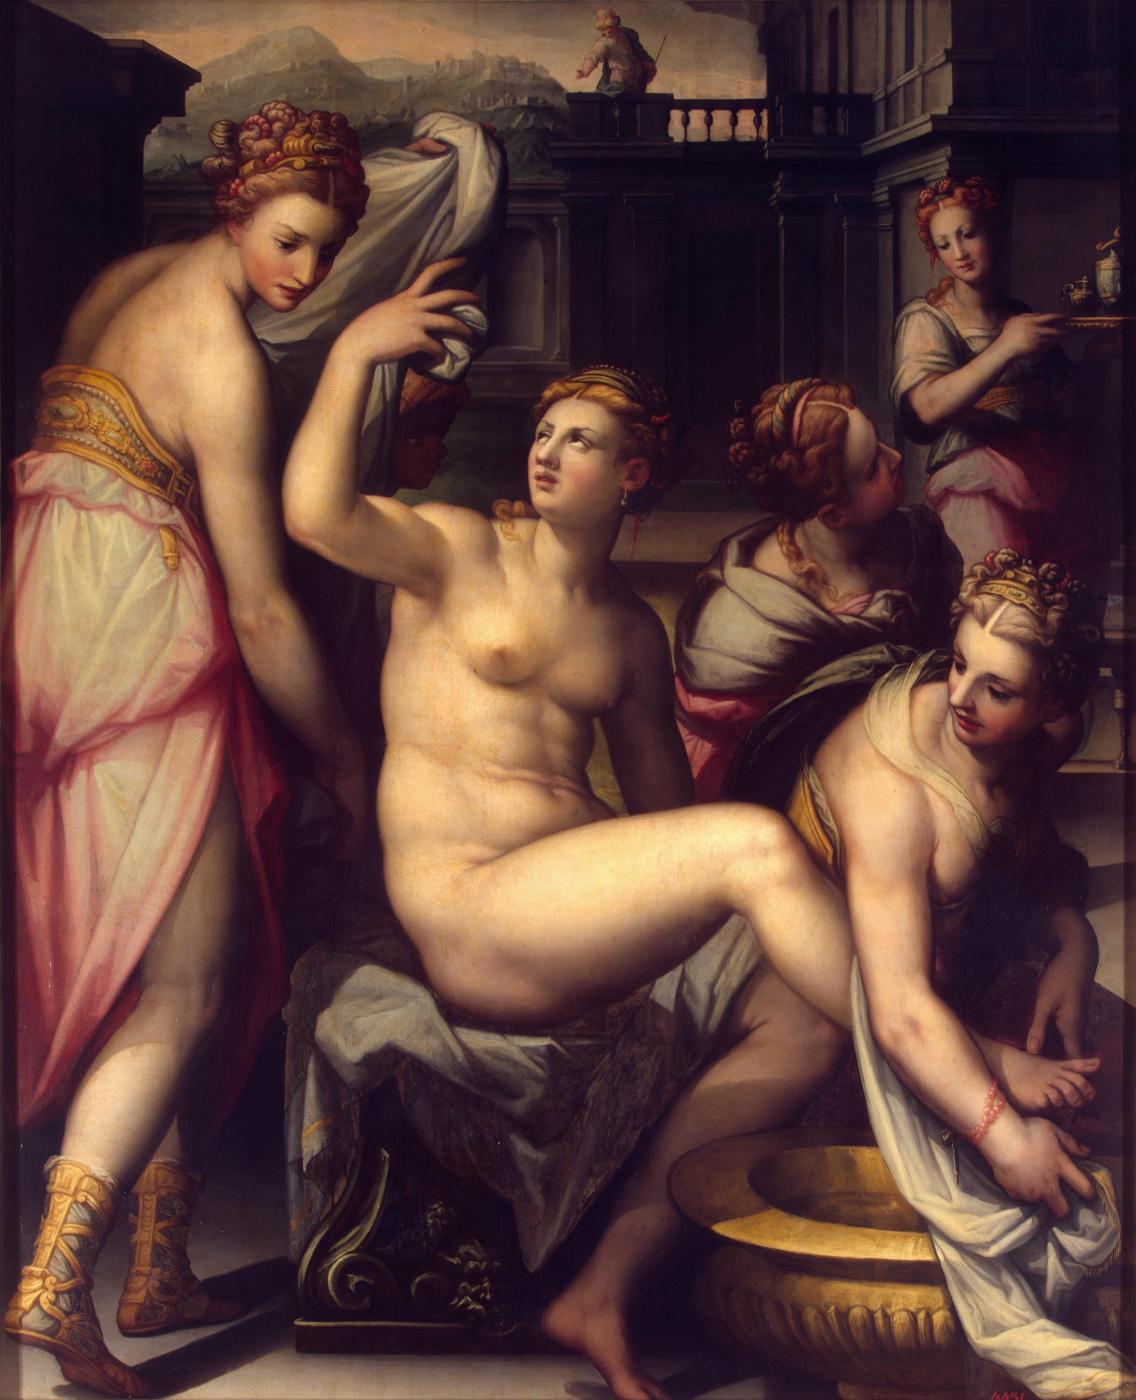 Giovanni Battista Naldini. Bathsheba in the bath